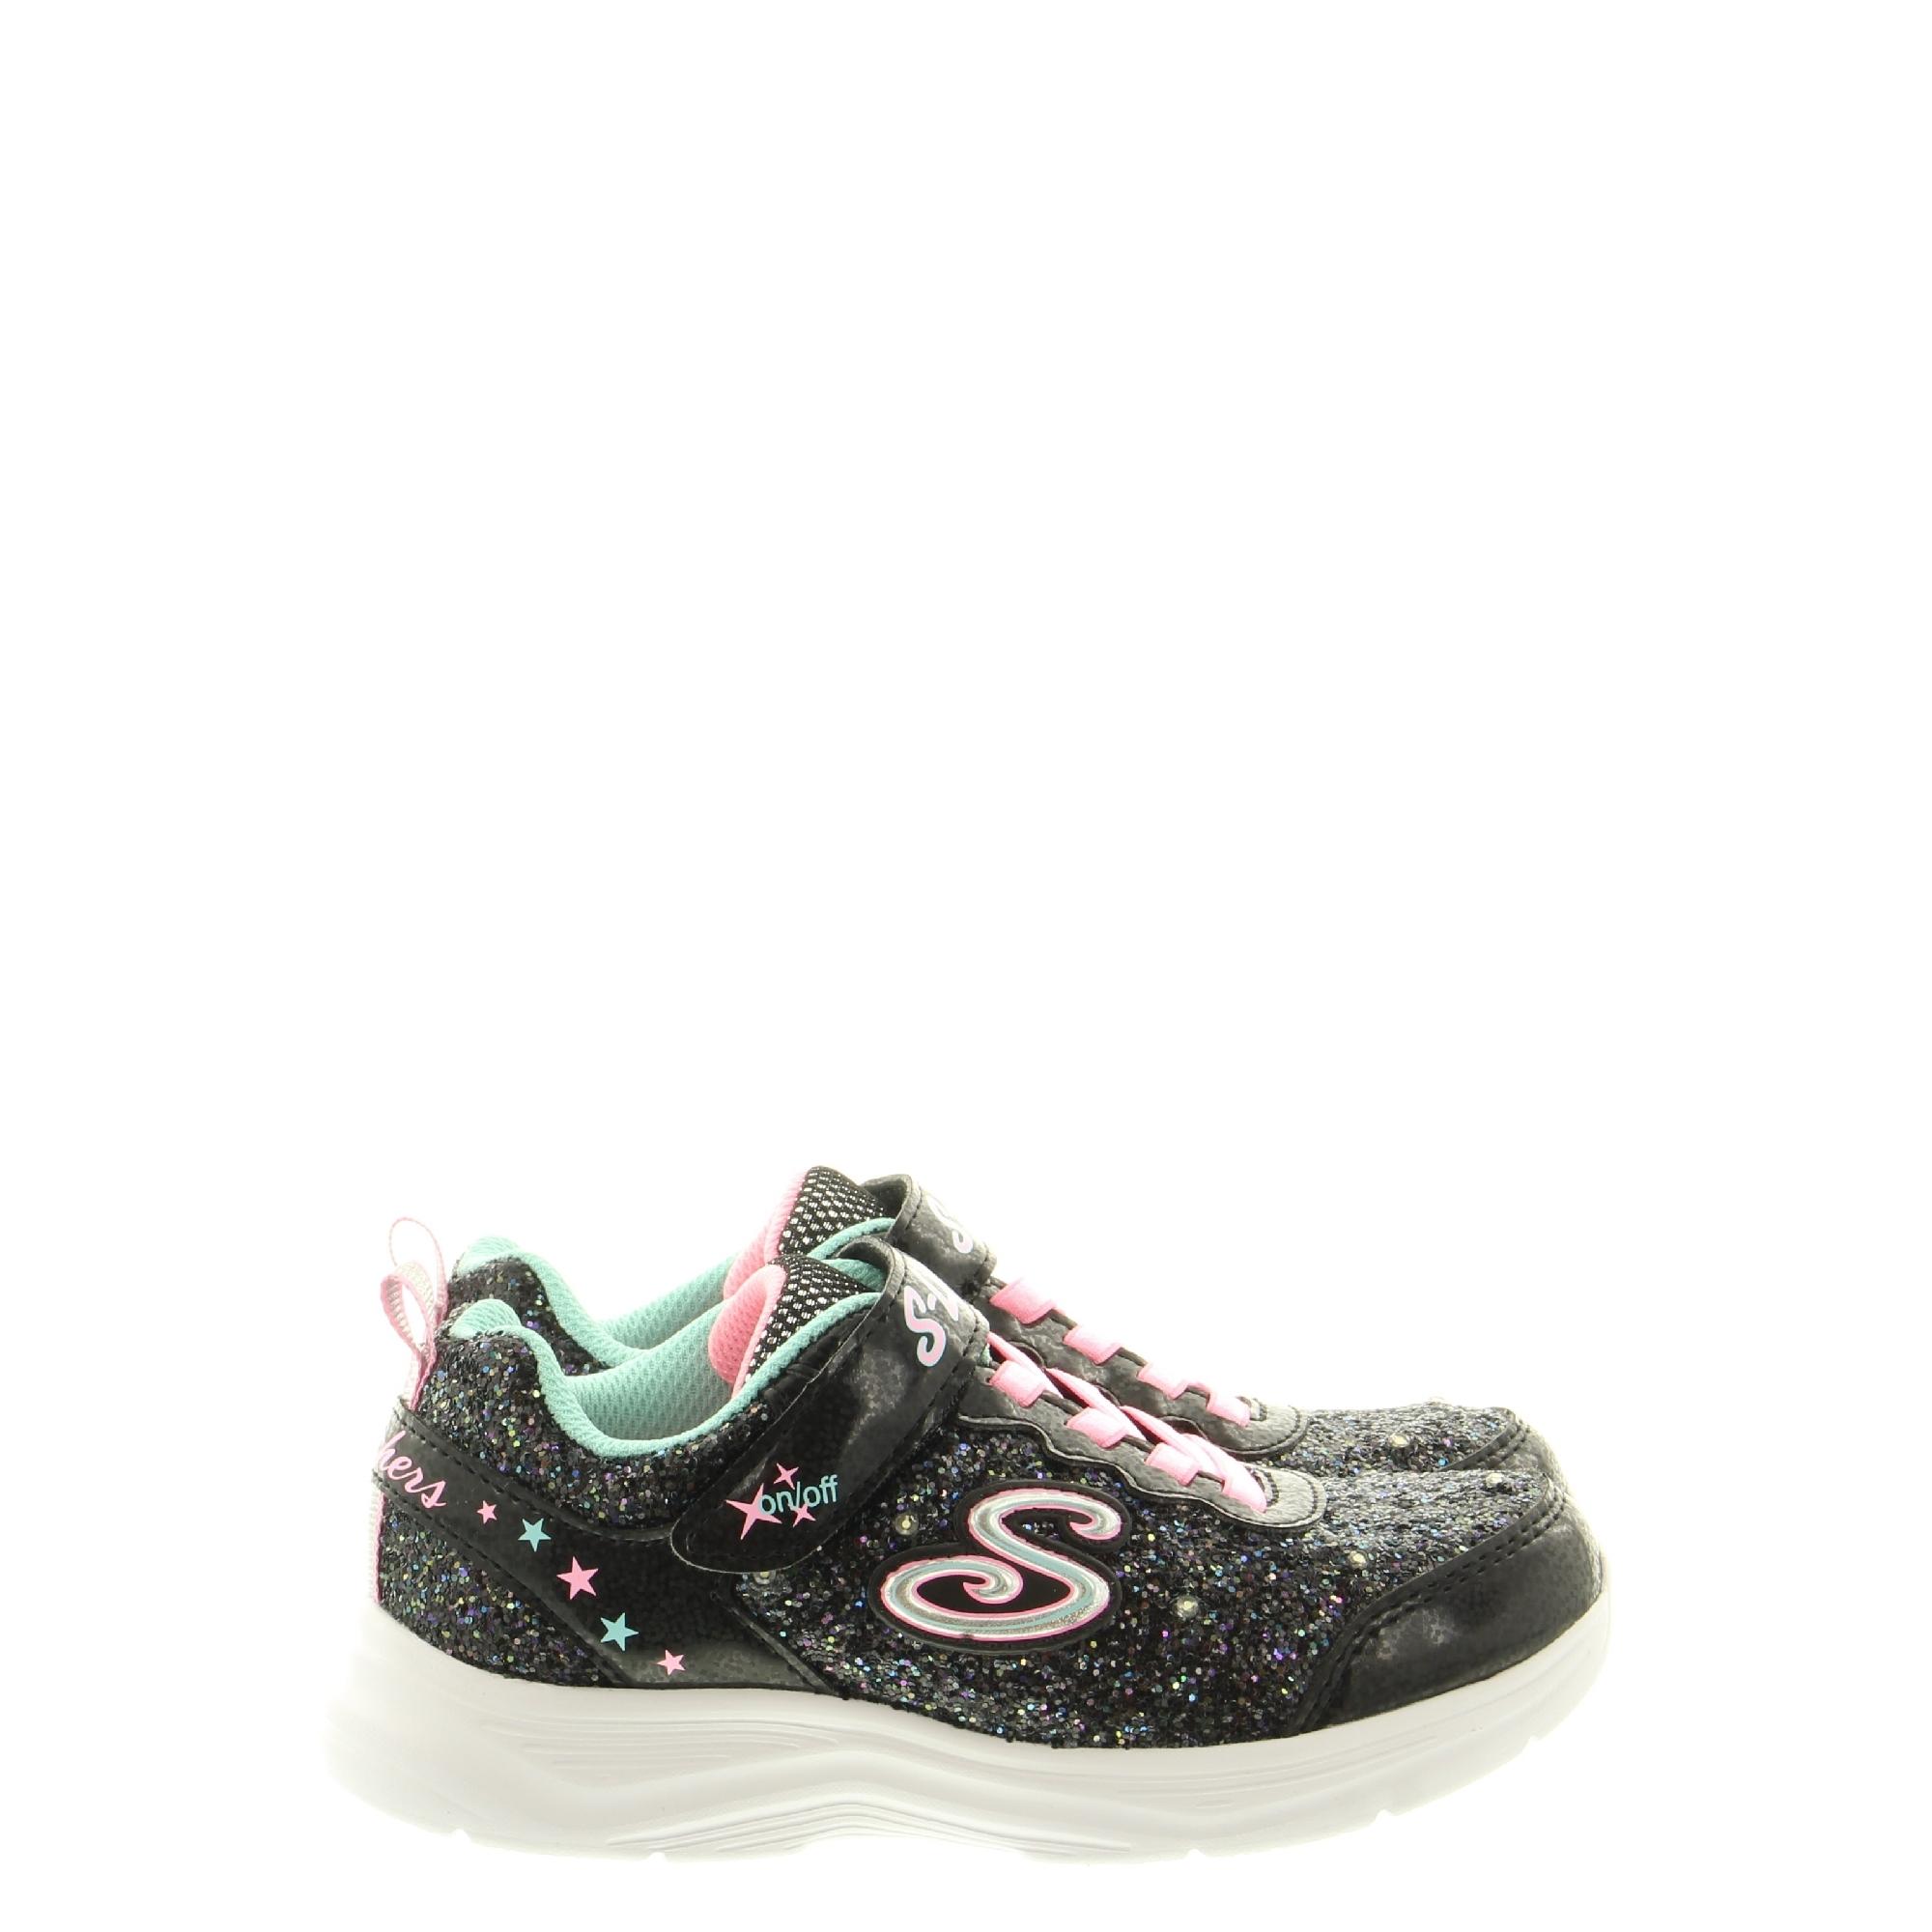 Skechers 20267 BKPK Black Pink